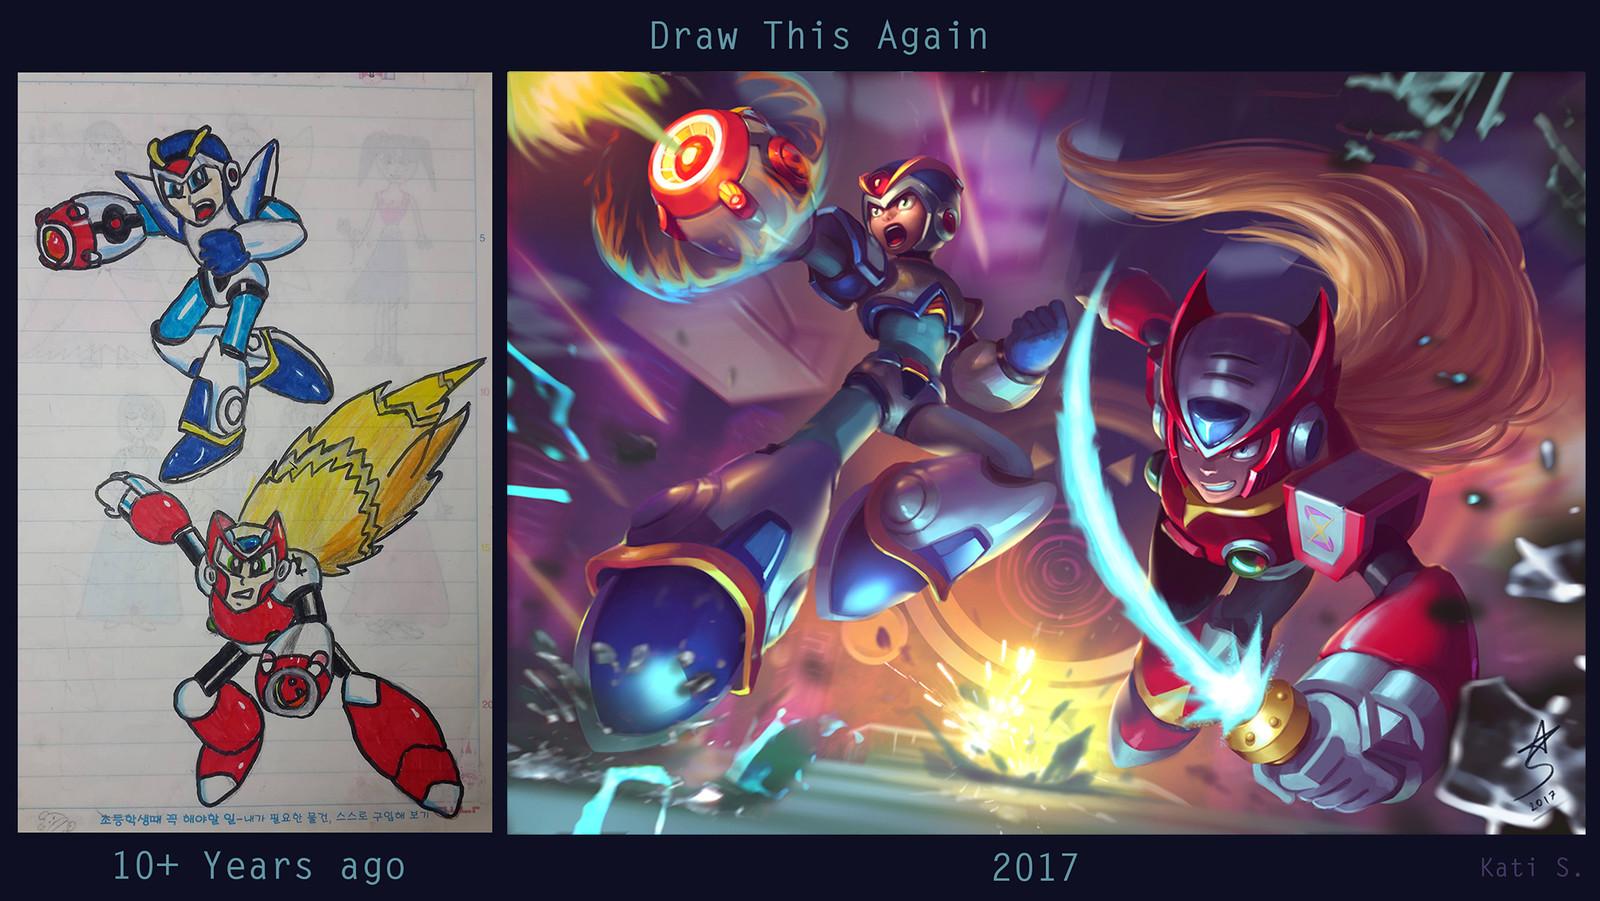 Draw this again.